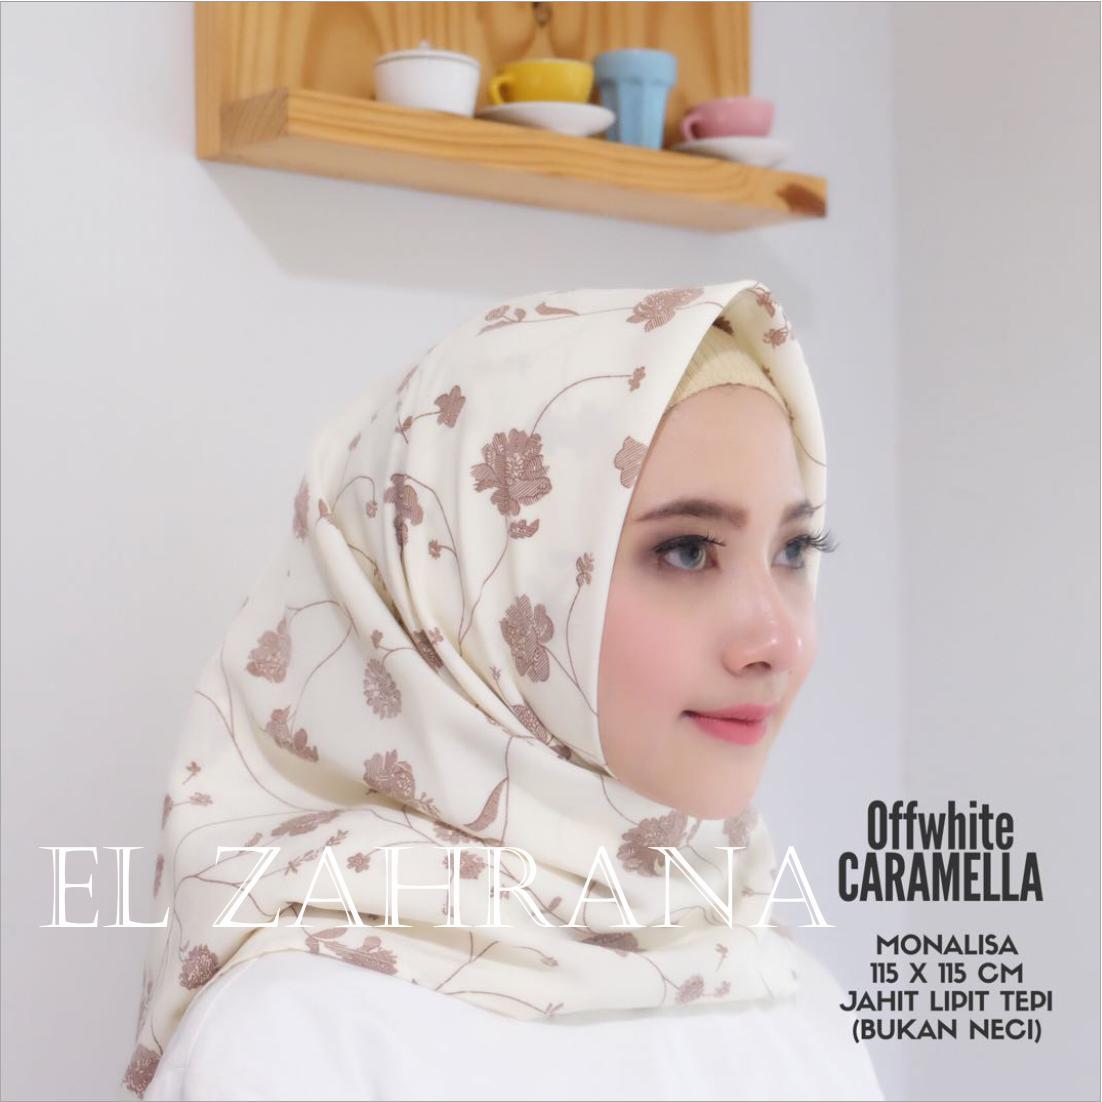 El Zahrana Hijab - Kerudung Segi Empat - Jilbab Motif Premium - Hijab Segi Empat -